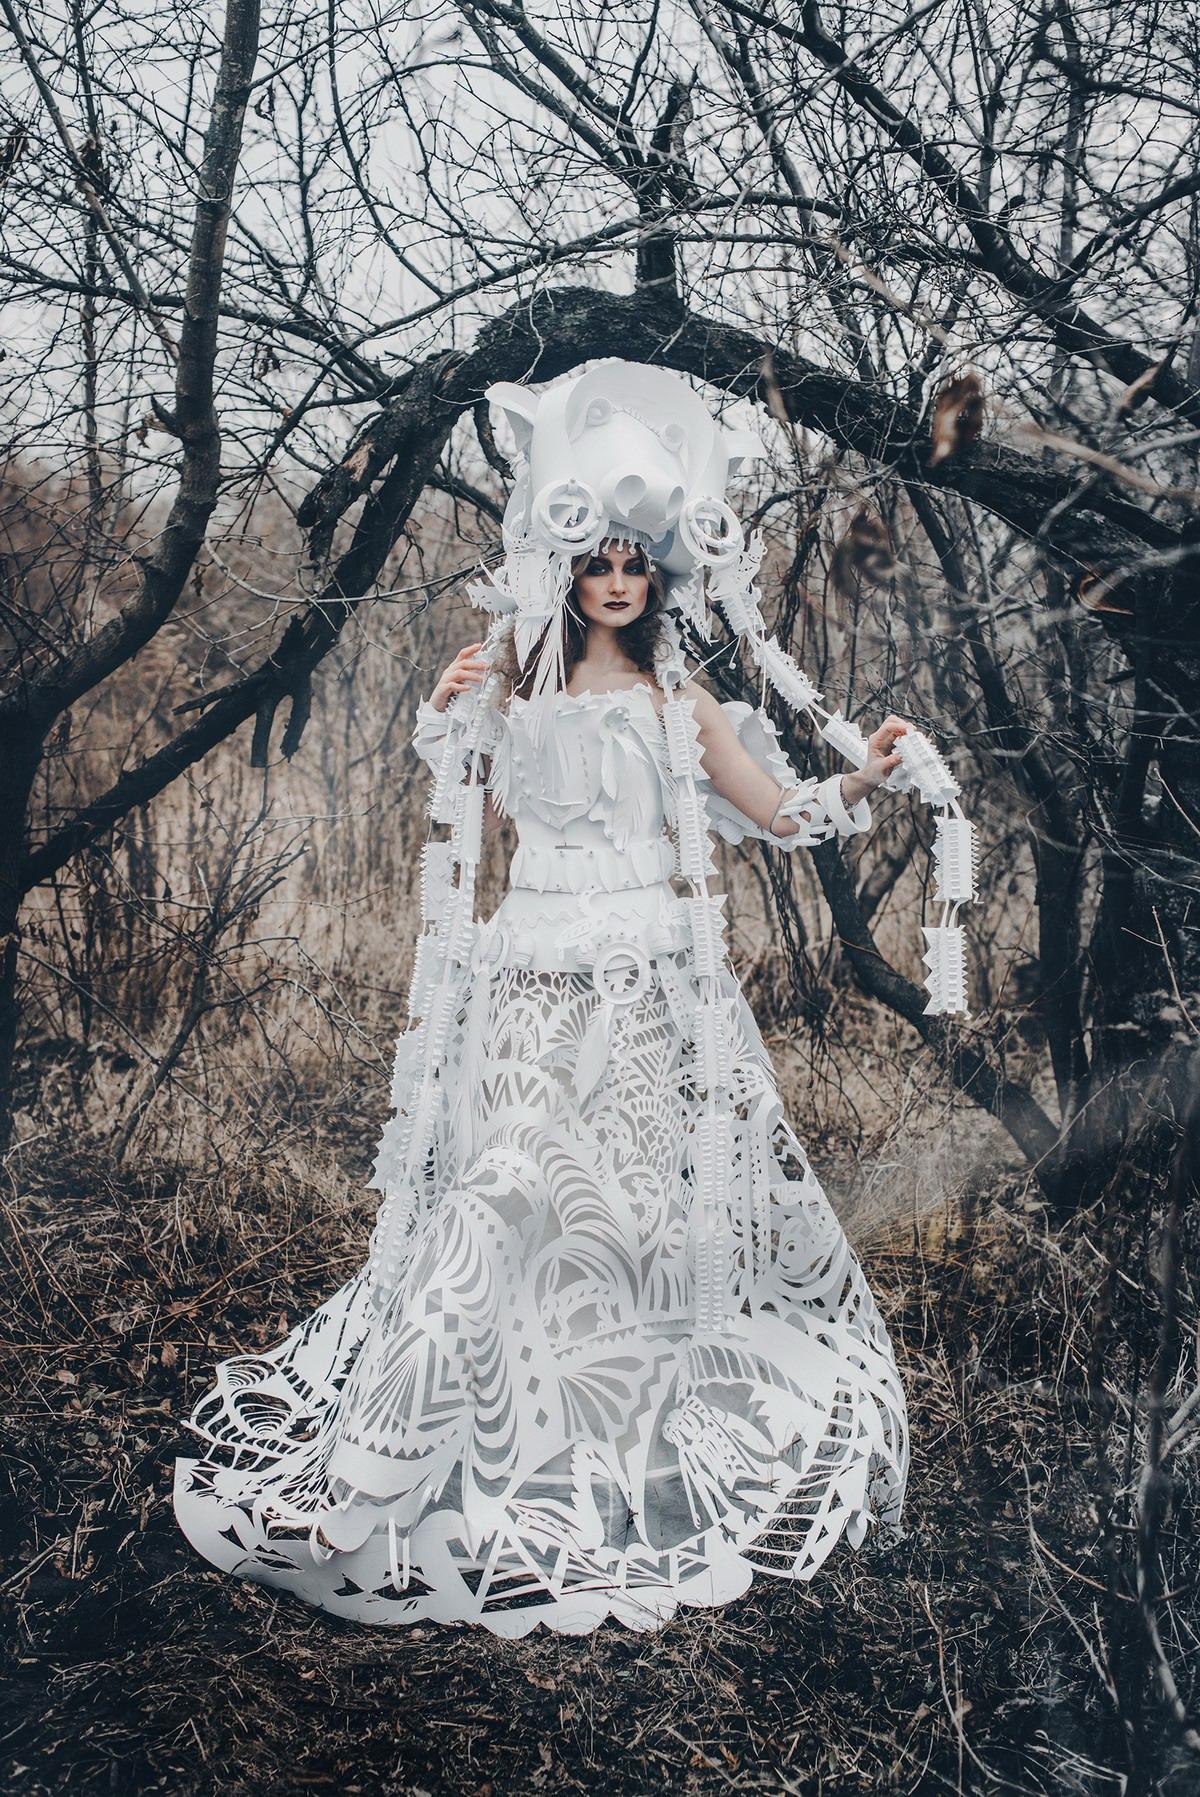 asya kozina - szamanka